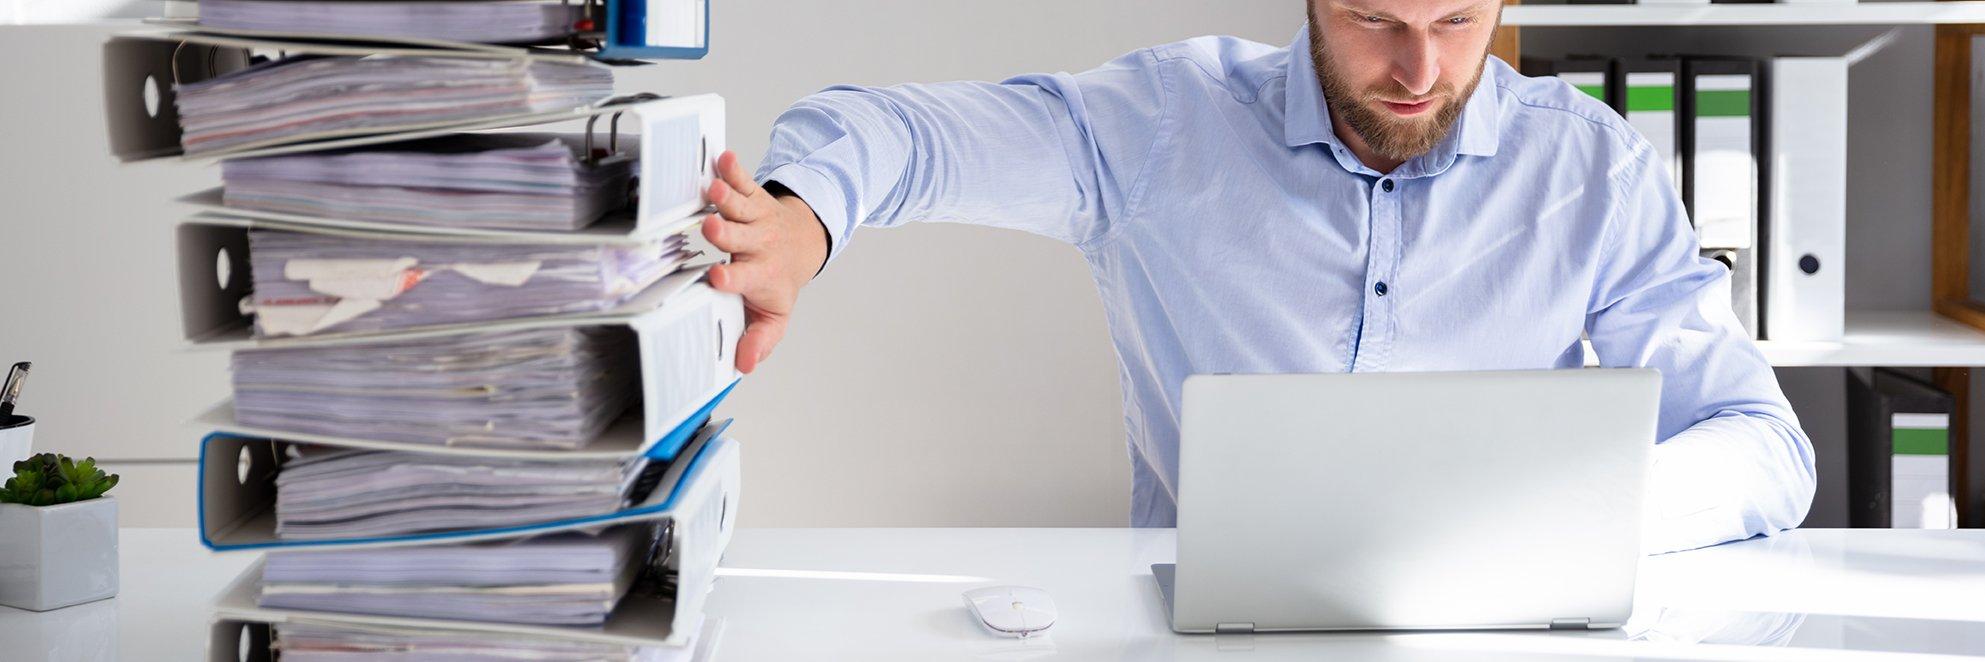 Making Tax Digital And The Digital Adoption